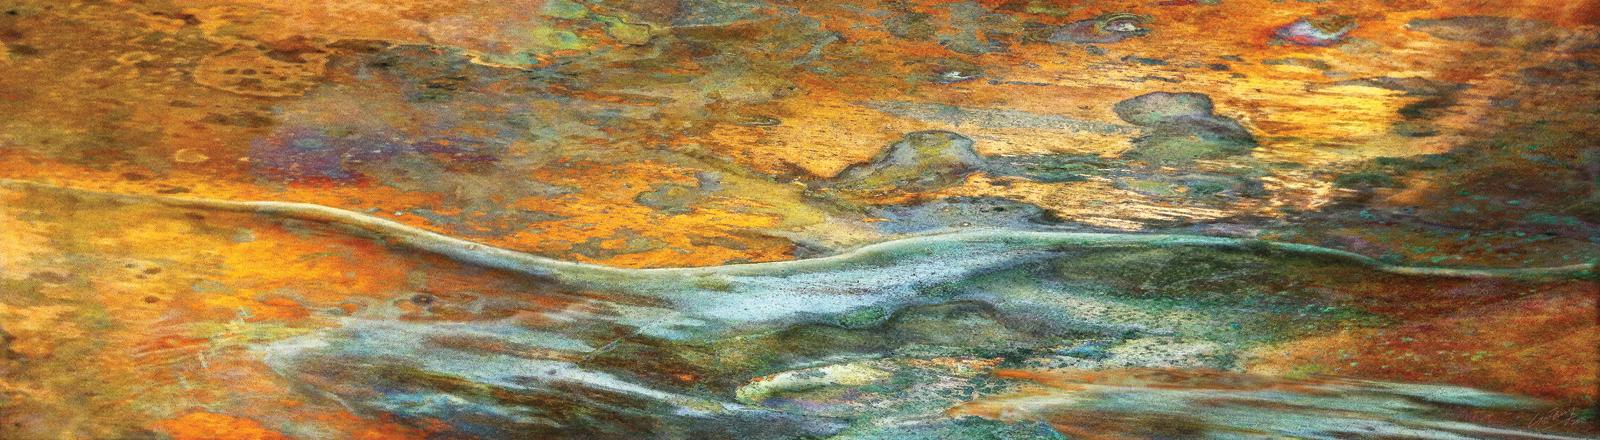 Shifting Landscape VI